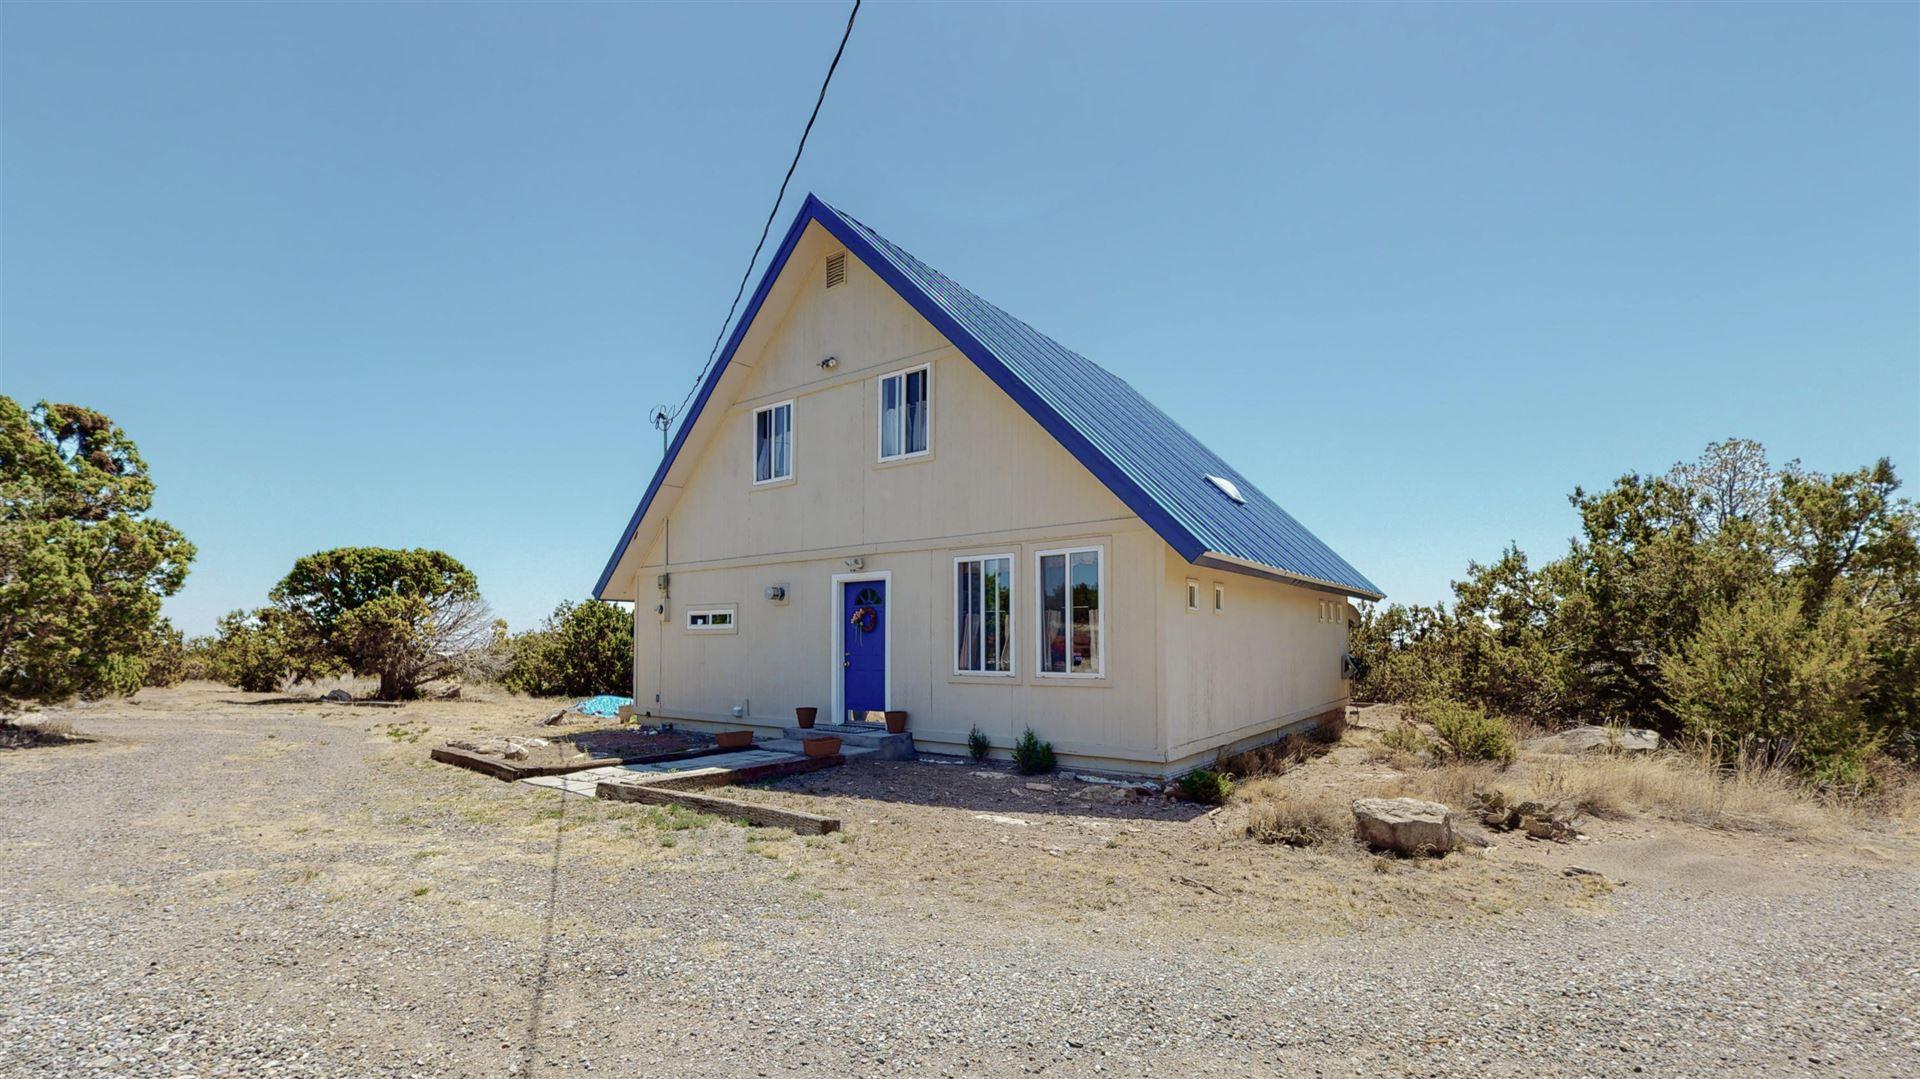 Photo of 165 Cedar Lane, Moriarty, NM 87035 (MLS # 991612)